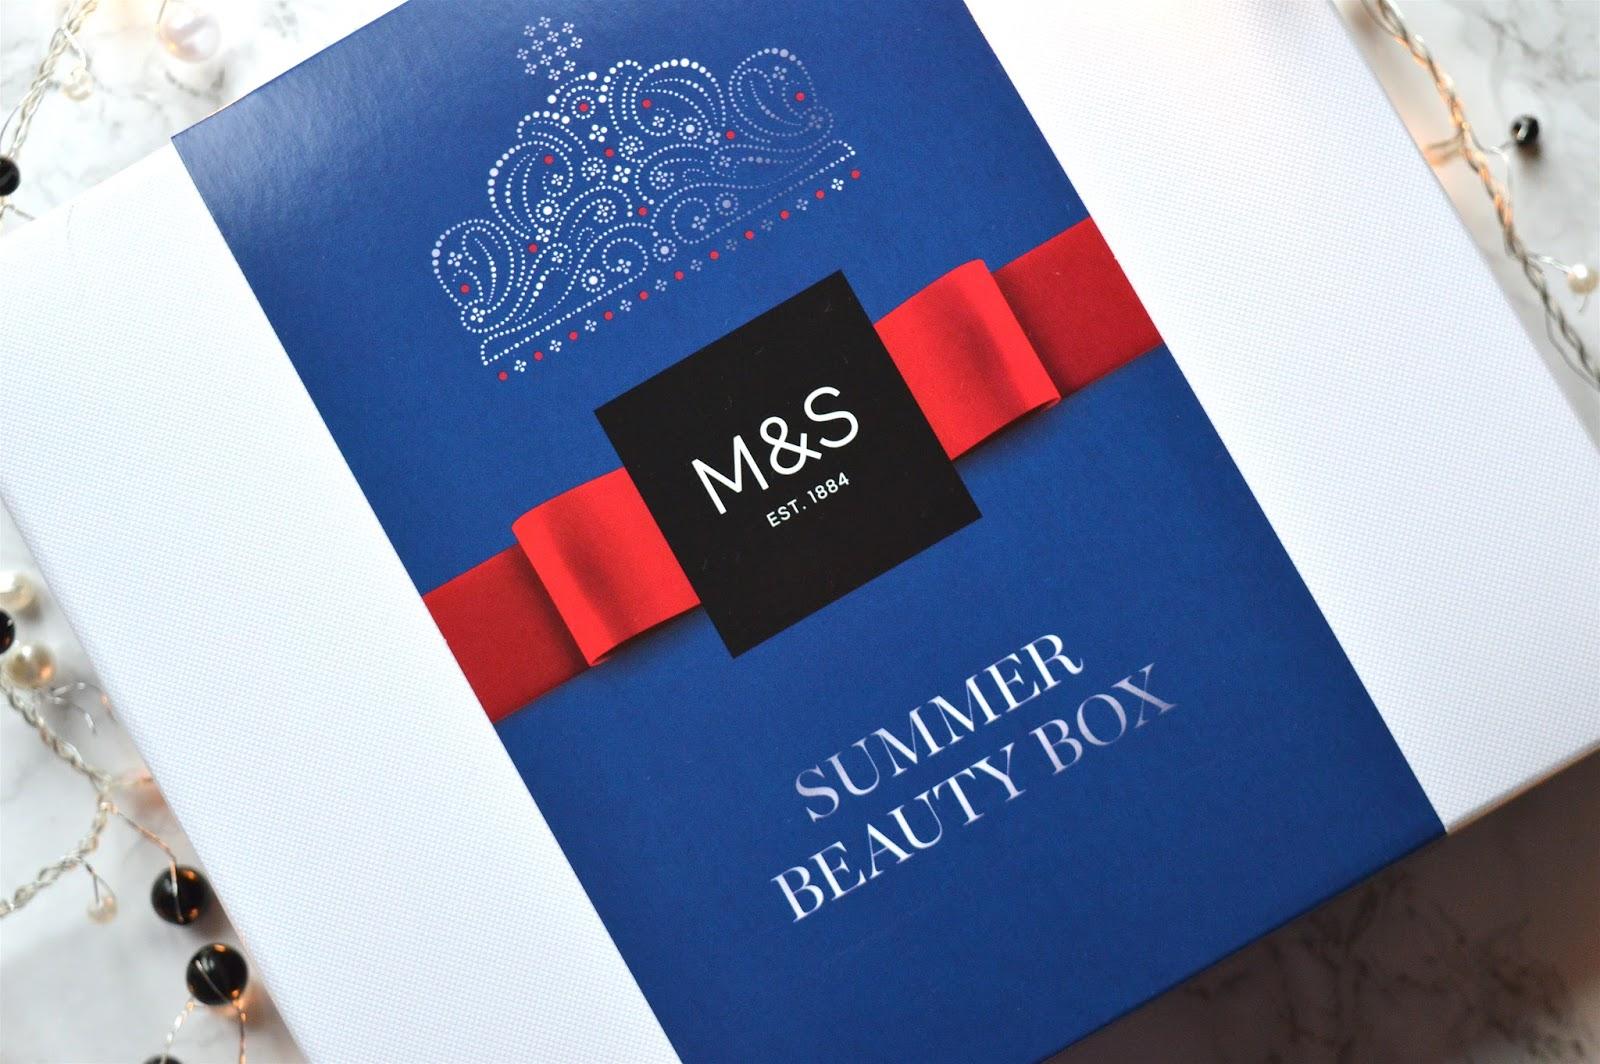 Marks & Spencer Summer Beauty Box